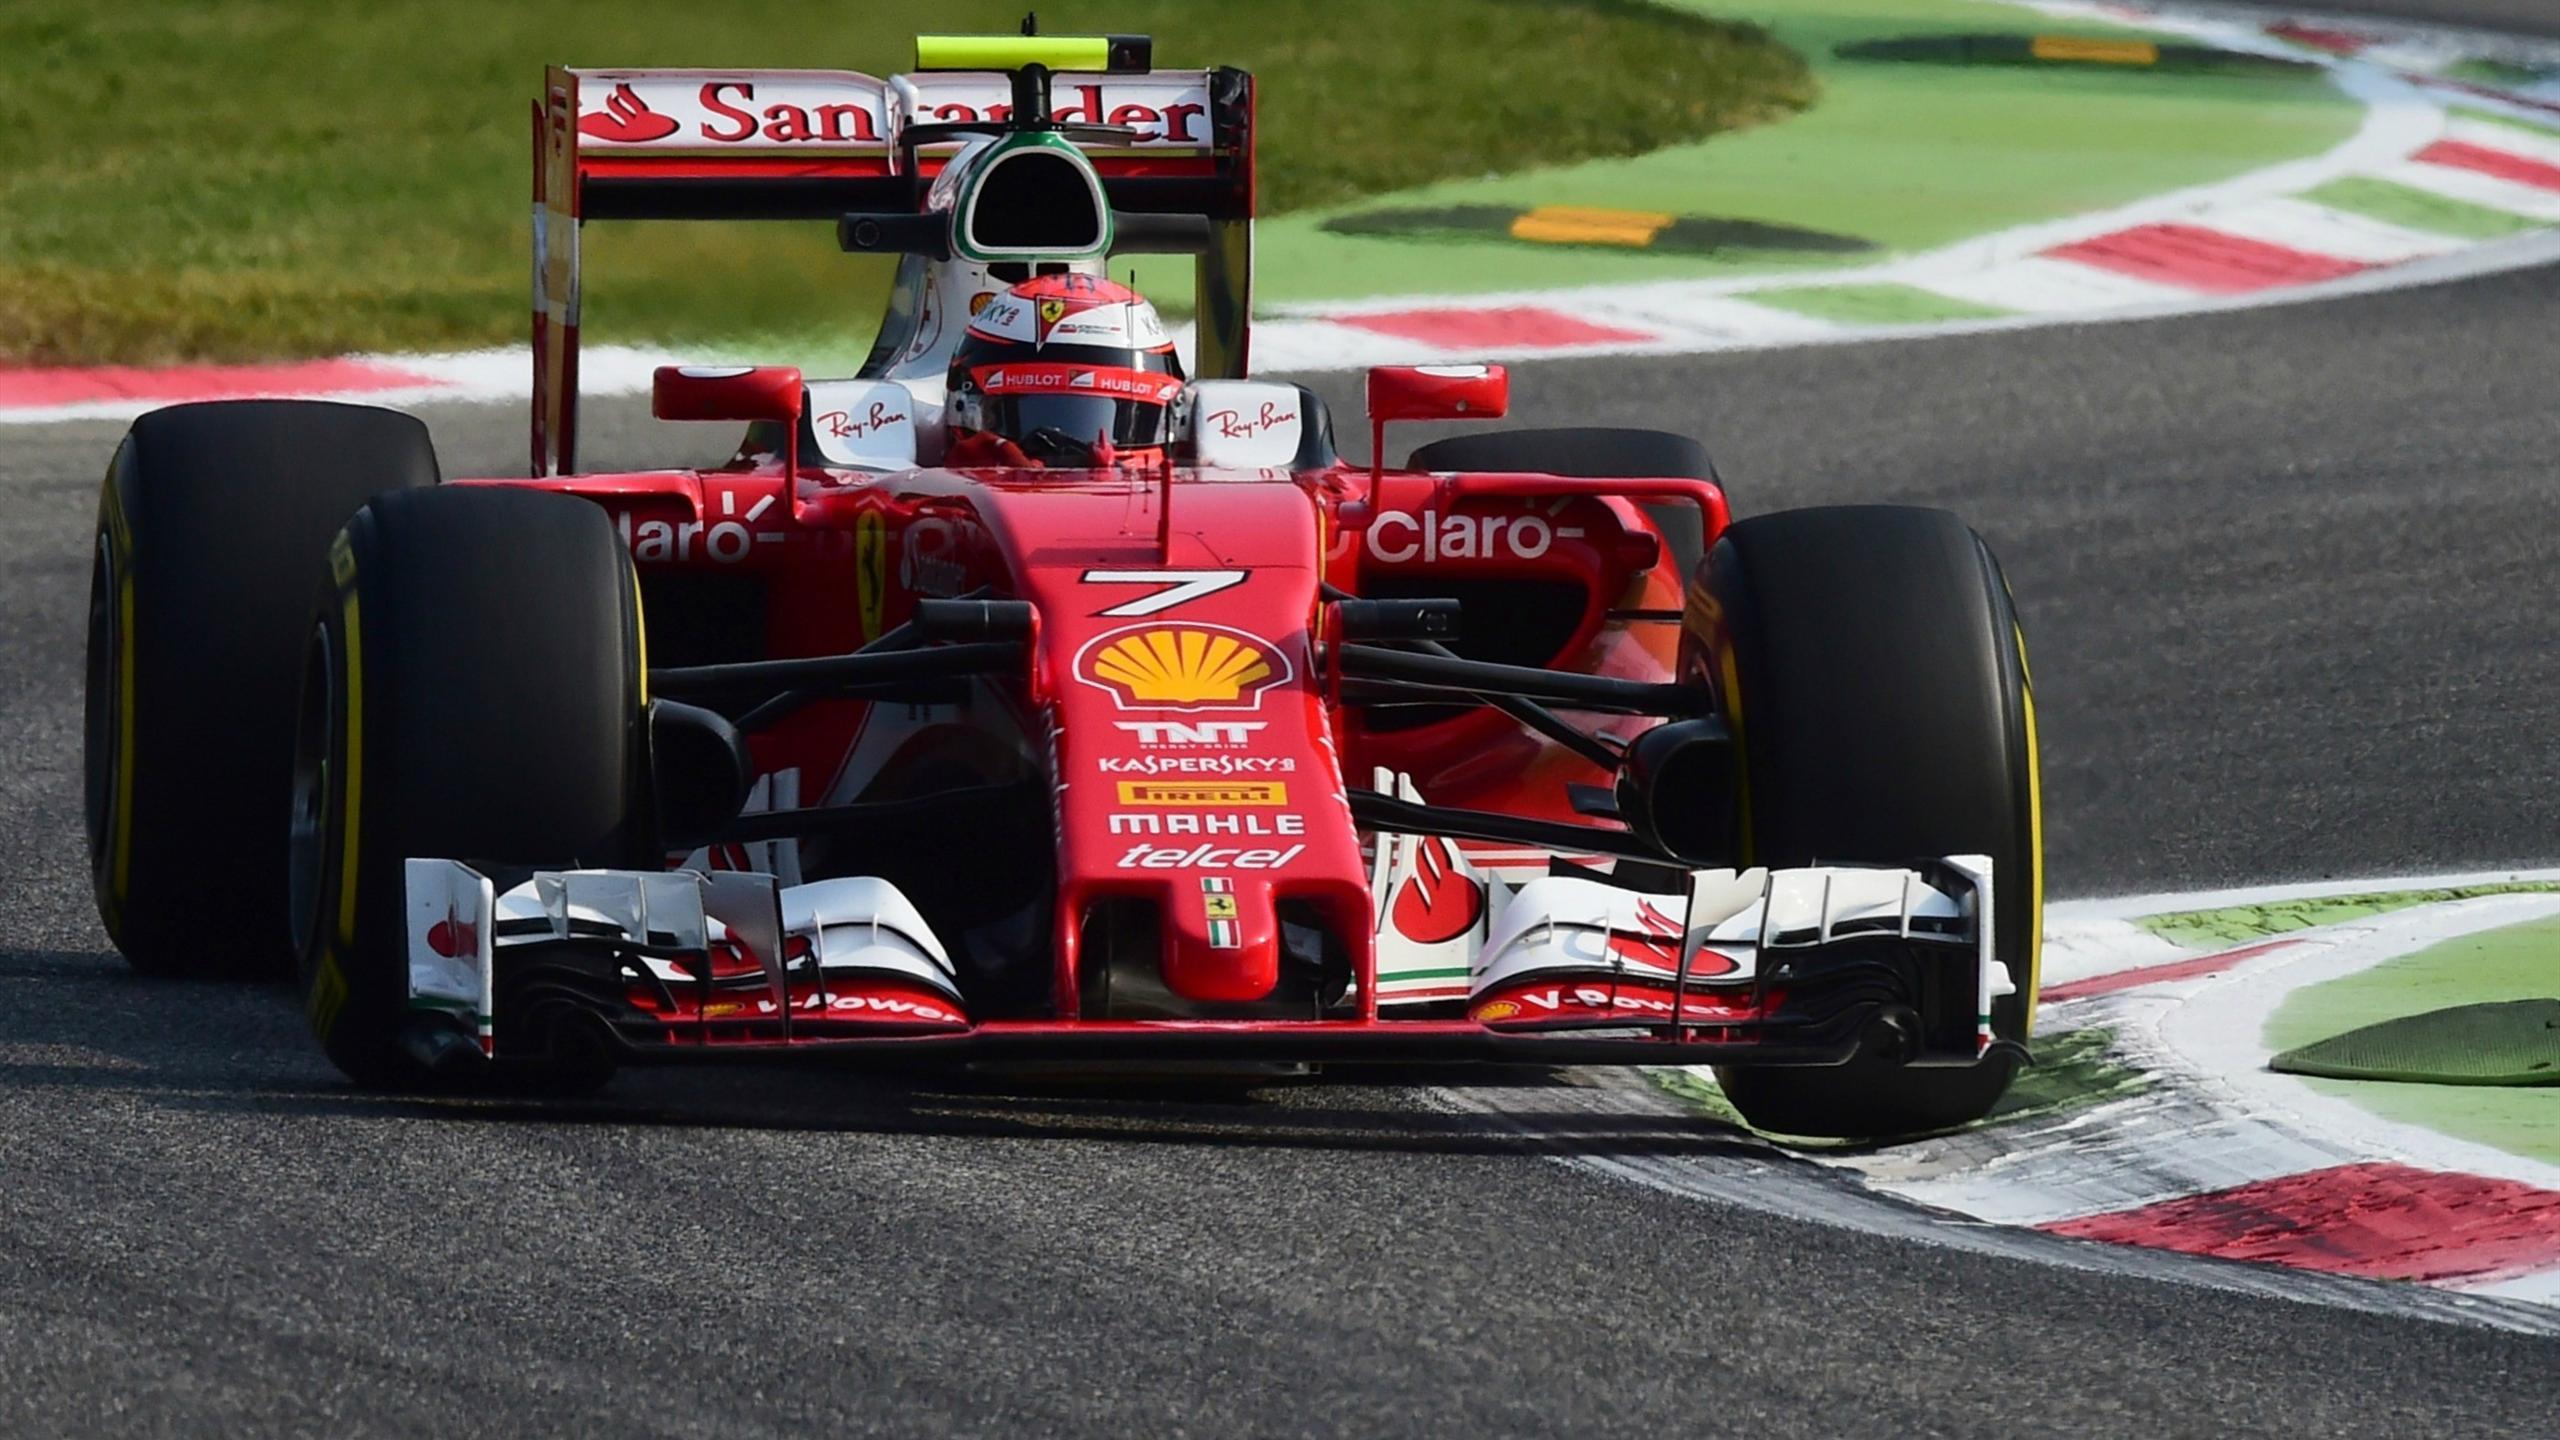 Kimi Räikkönen (Ferrari) au Grand Prix d'Italie 2016